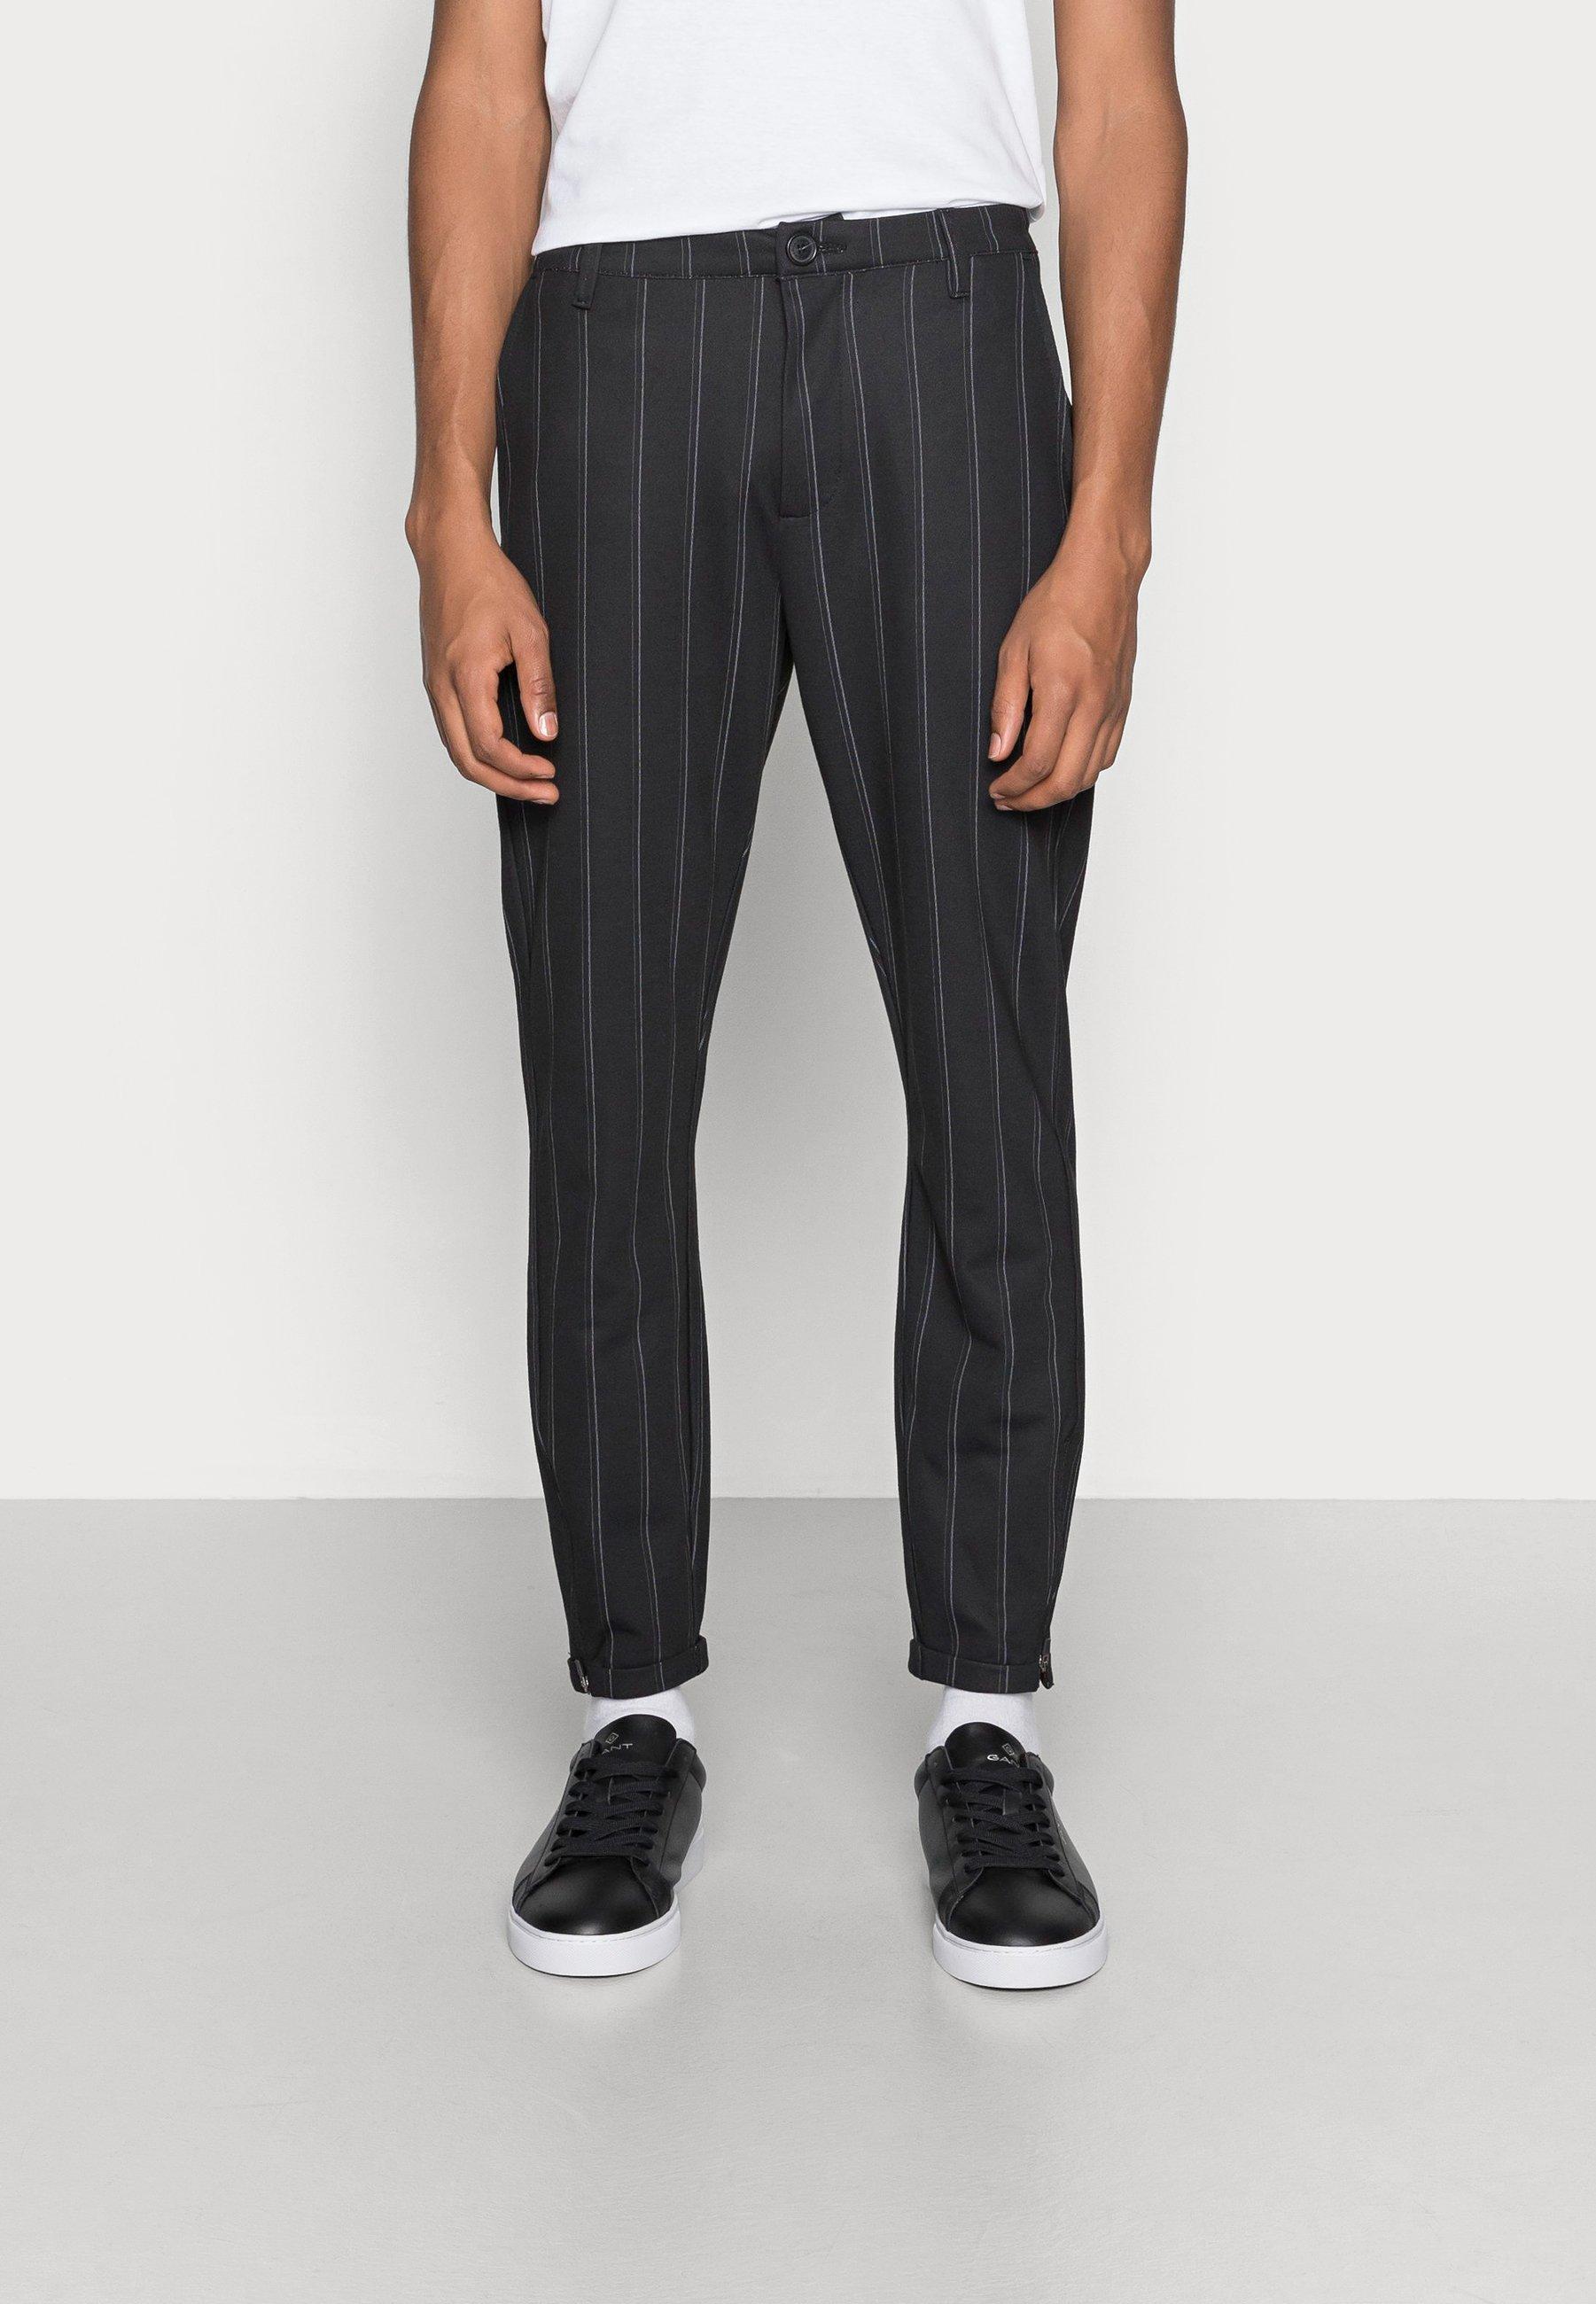 Uomo PISA STRIPE PANT - Pantaloni - black